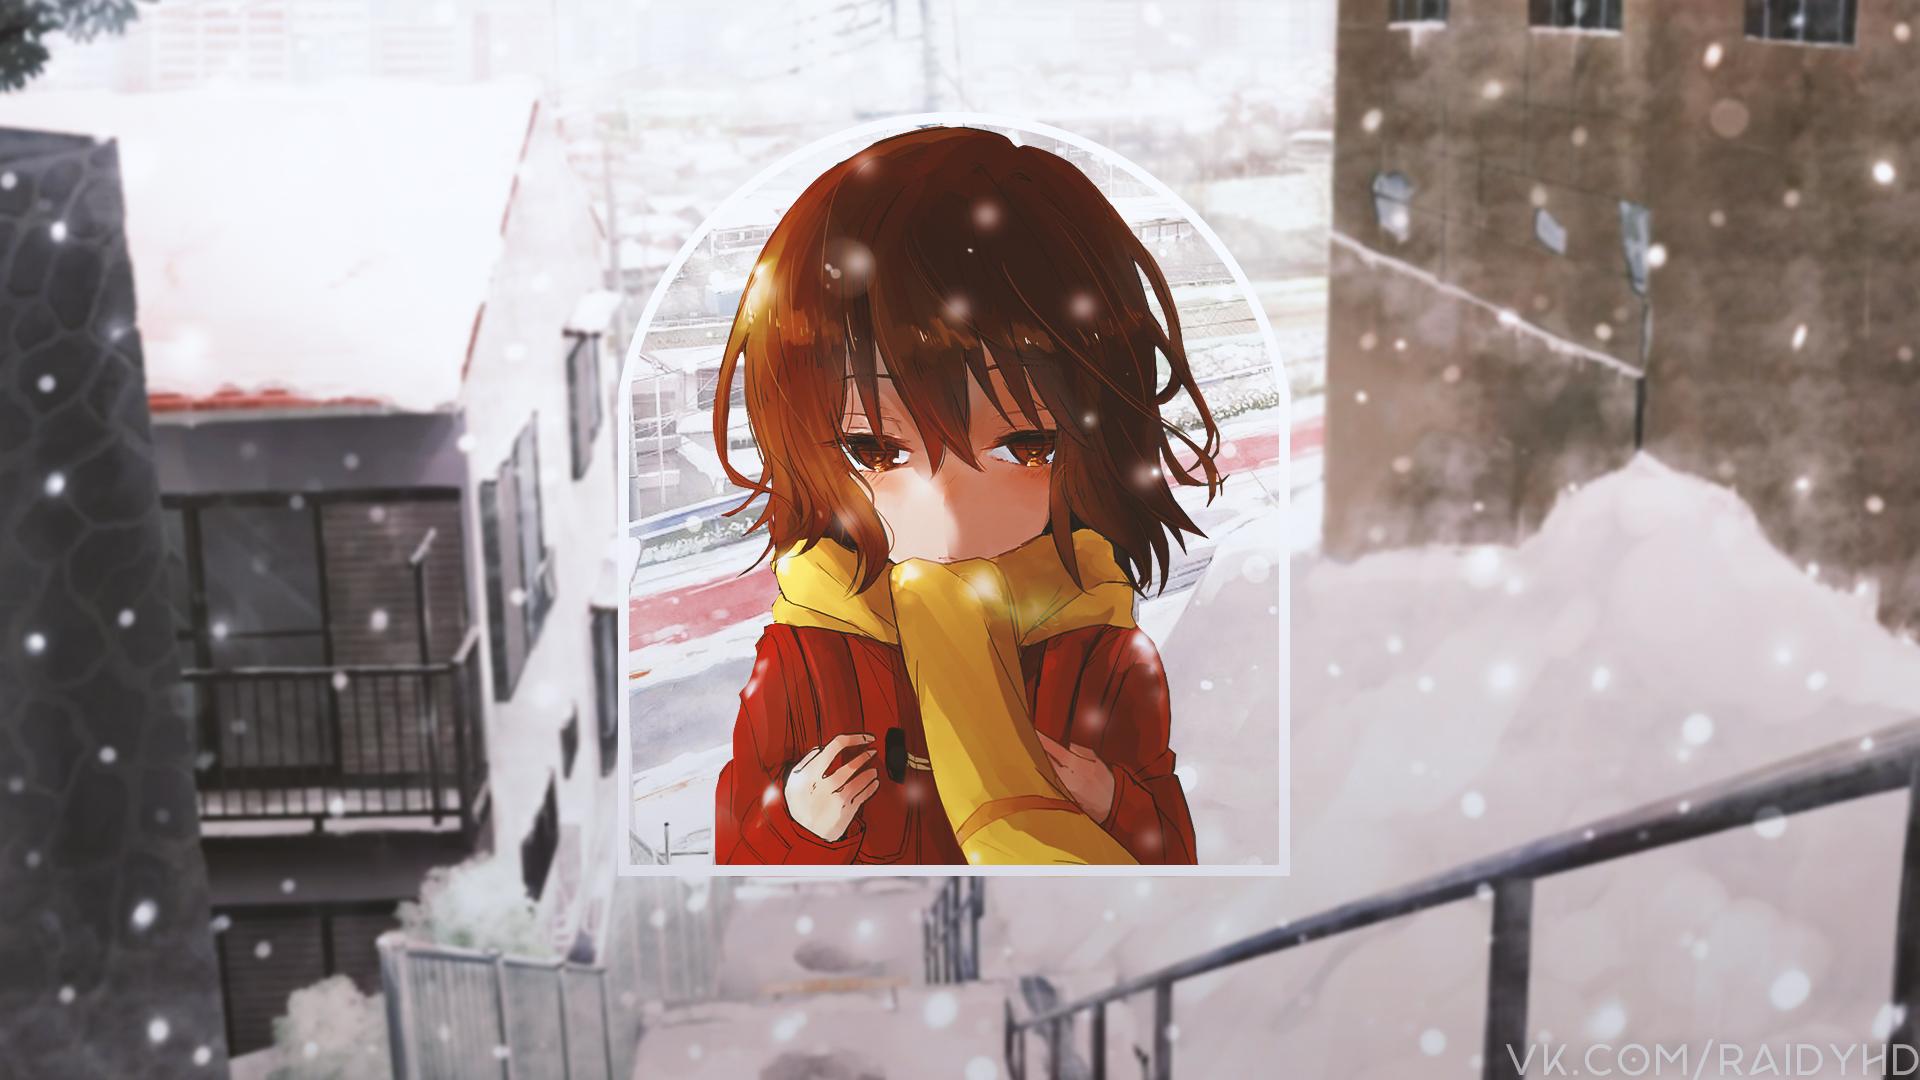 Wallpaper Anime Girls Raidy Hd Picture In Picture Boku Dake